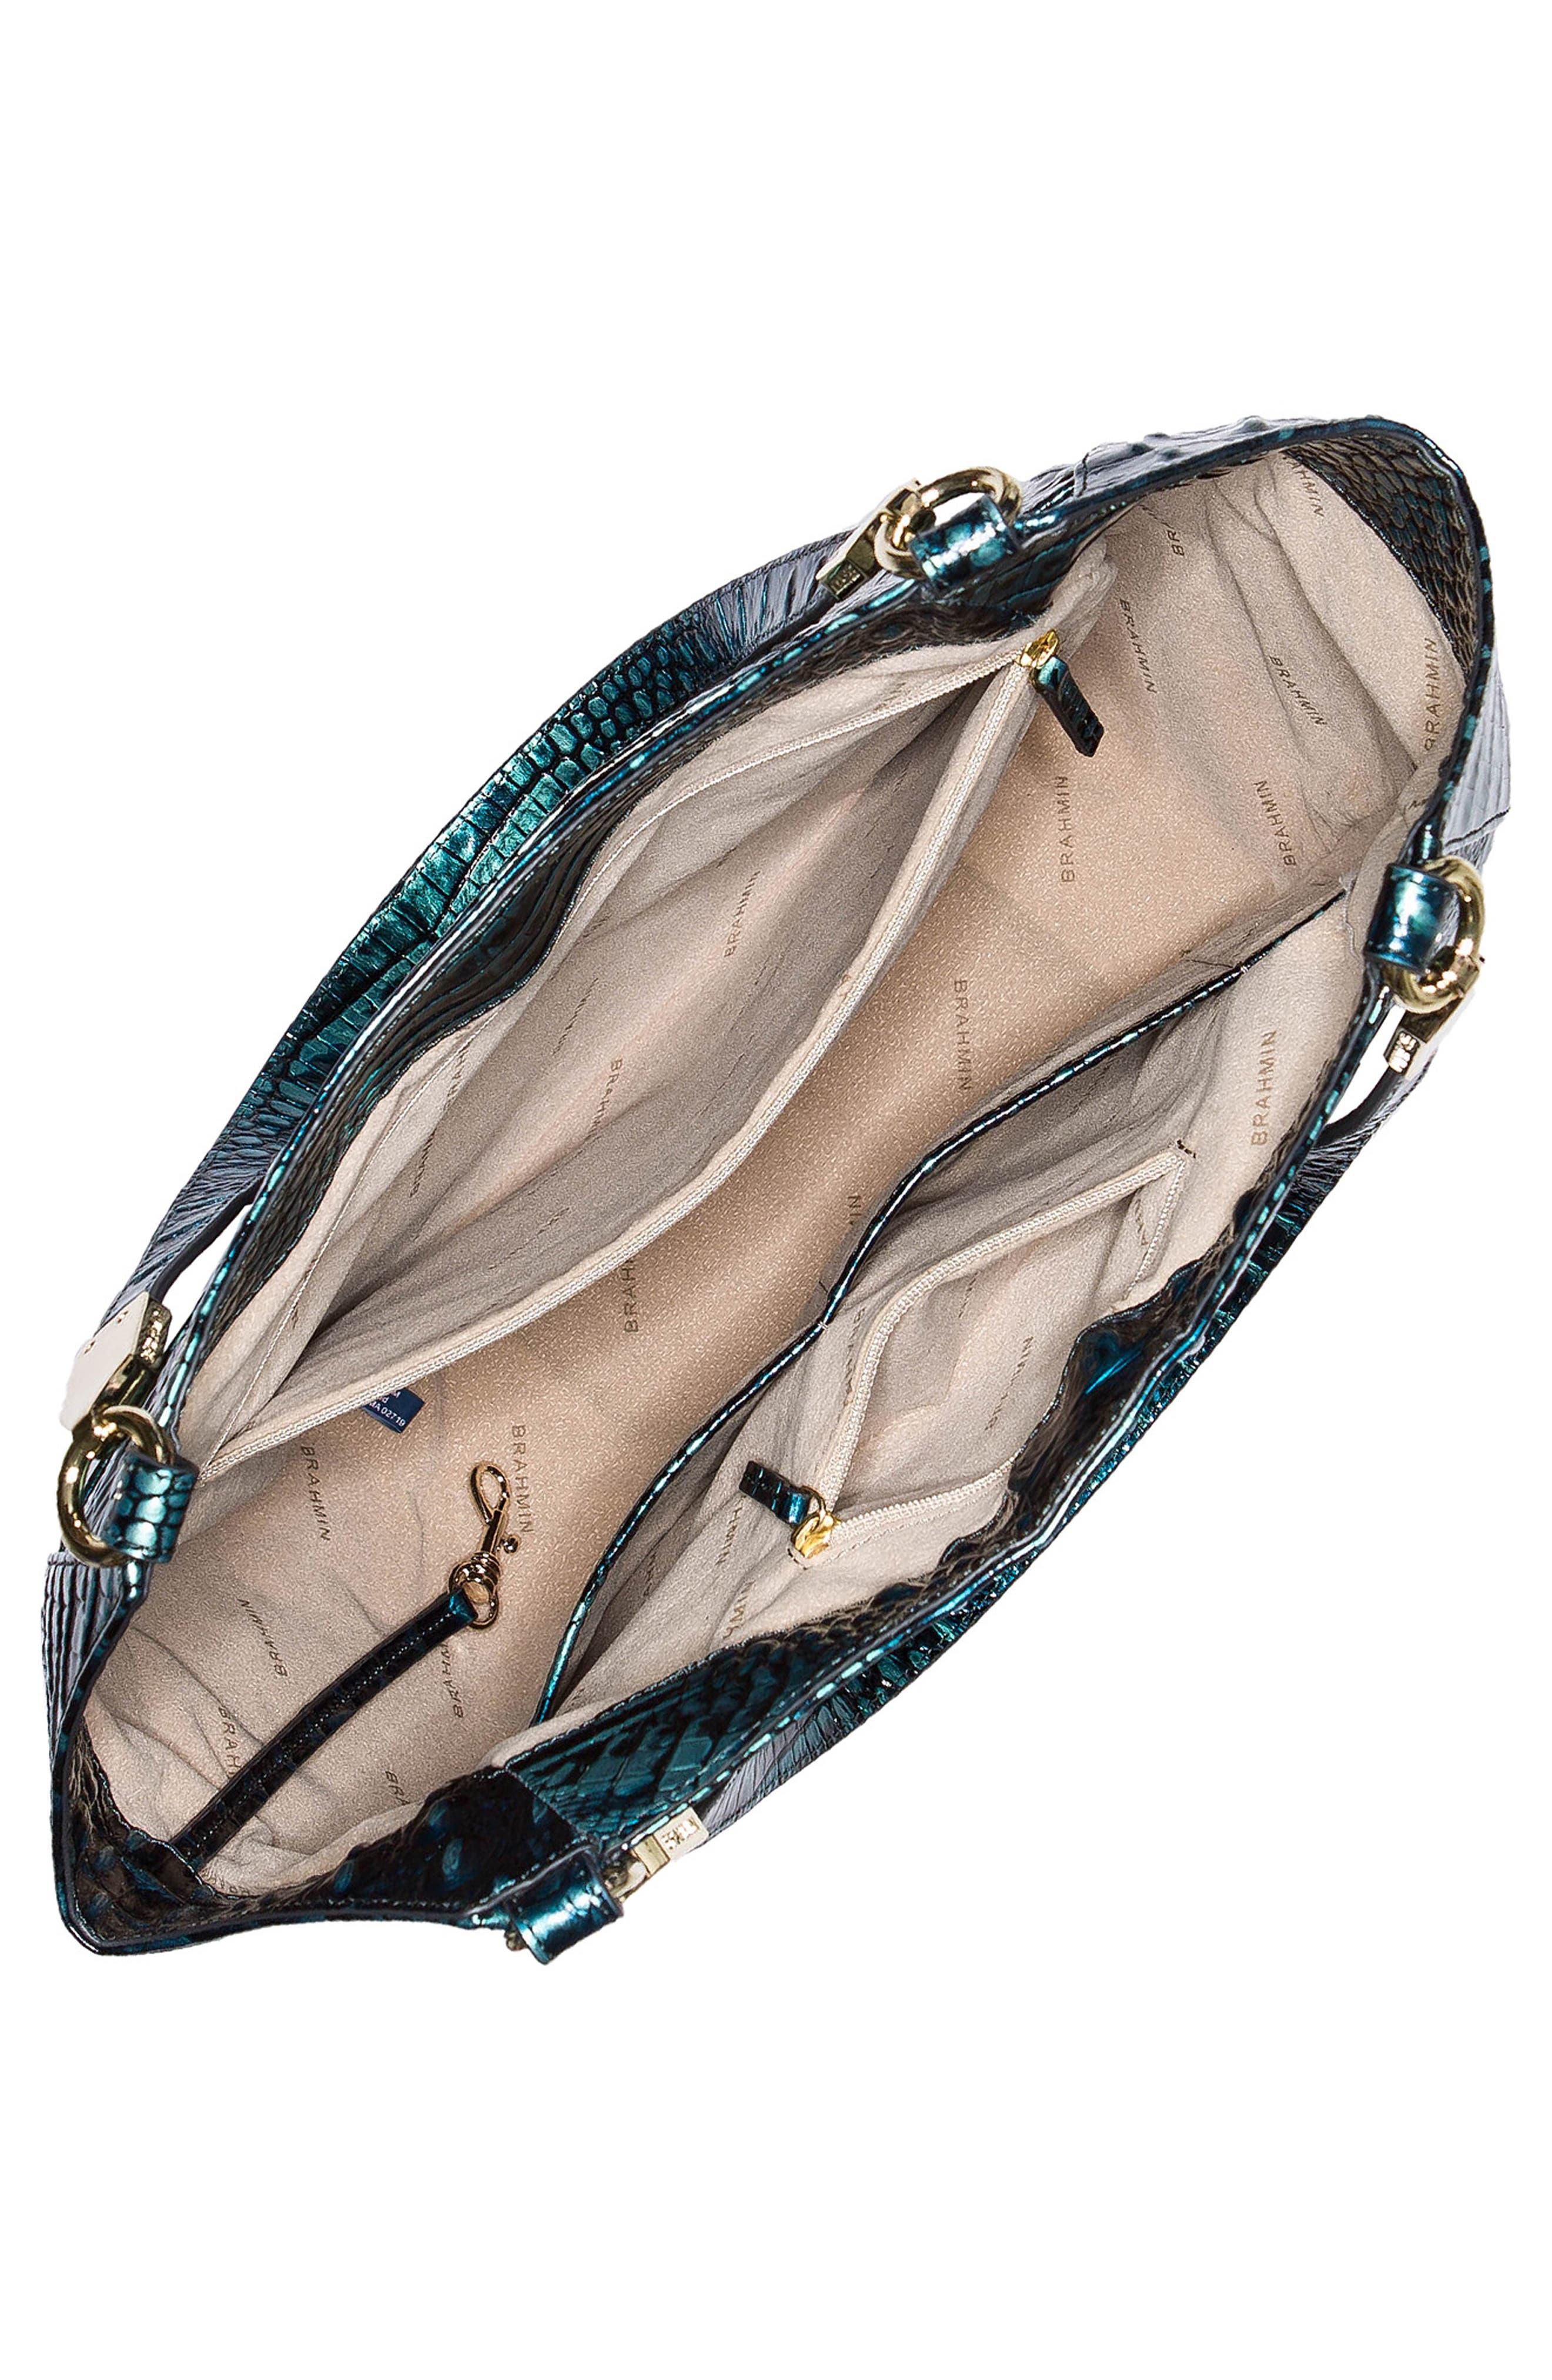 Melbourne Marianna Leather Tote,                             Alternate thumbnail 3, color,                             VERDIGRIS